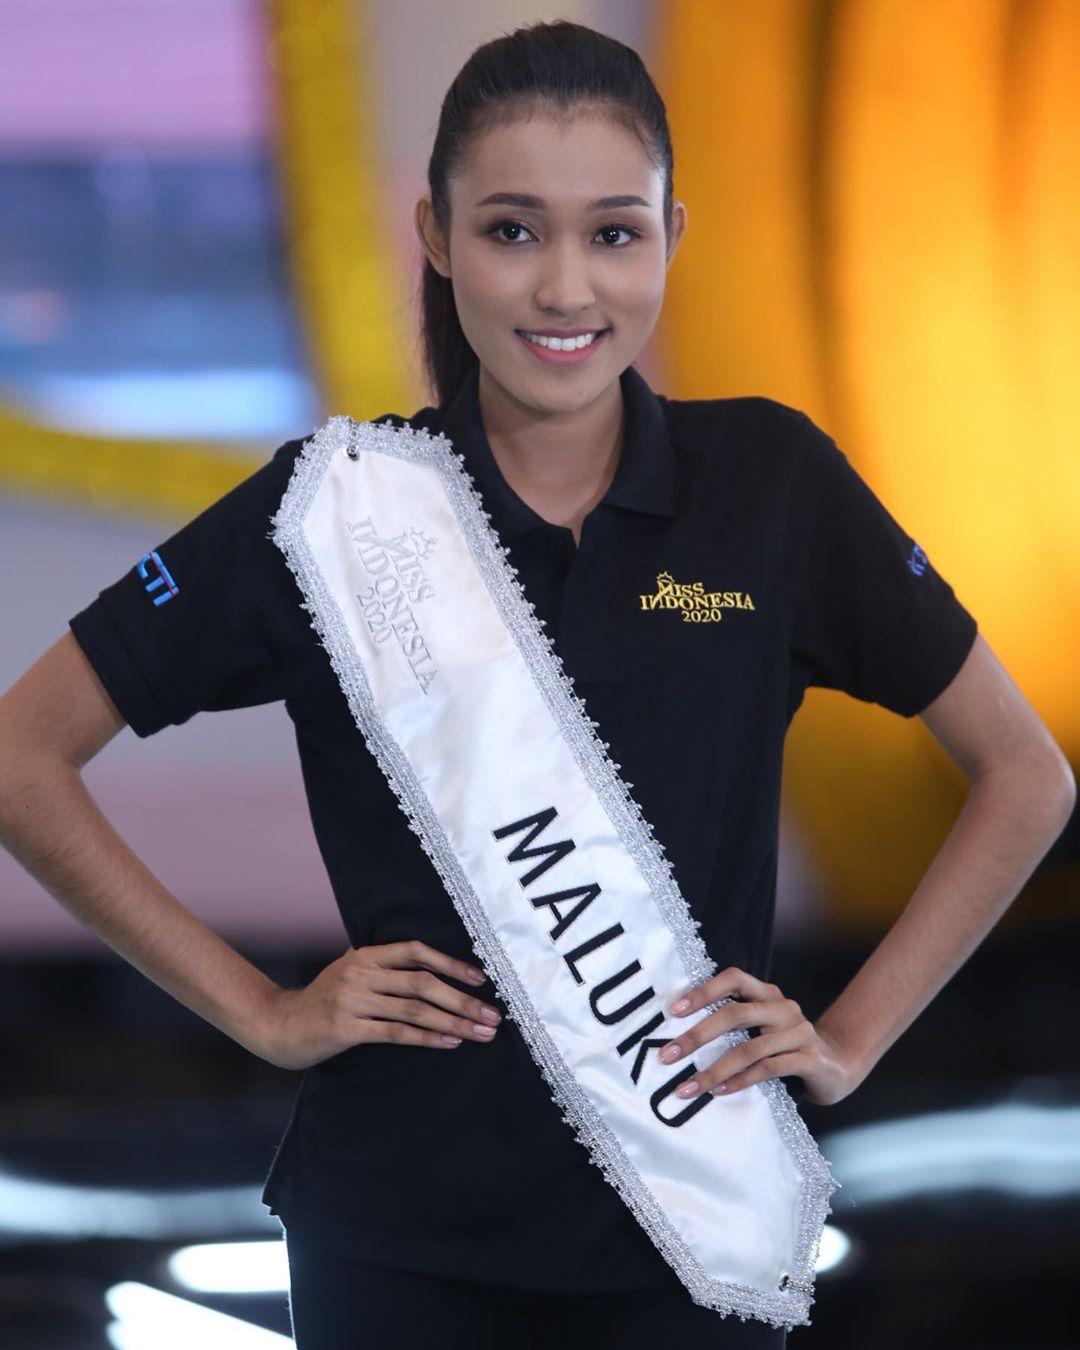 candidatas a miss indonesia 2020. final: 20 feb. - Página 2 IM03qW